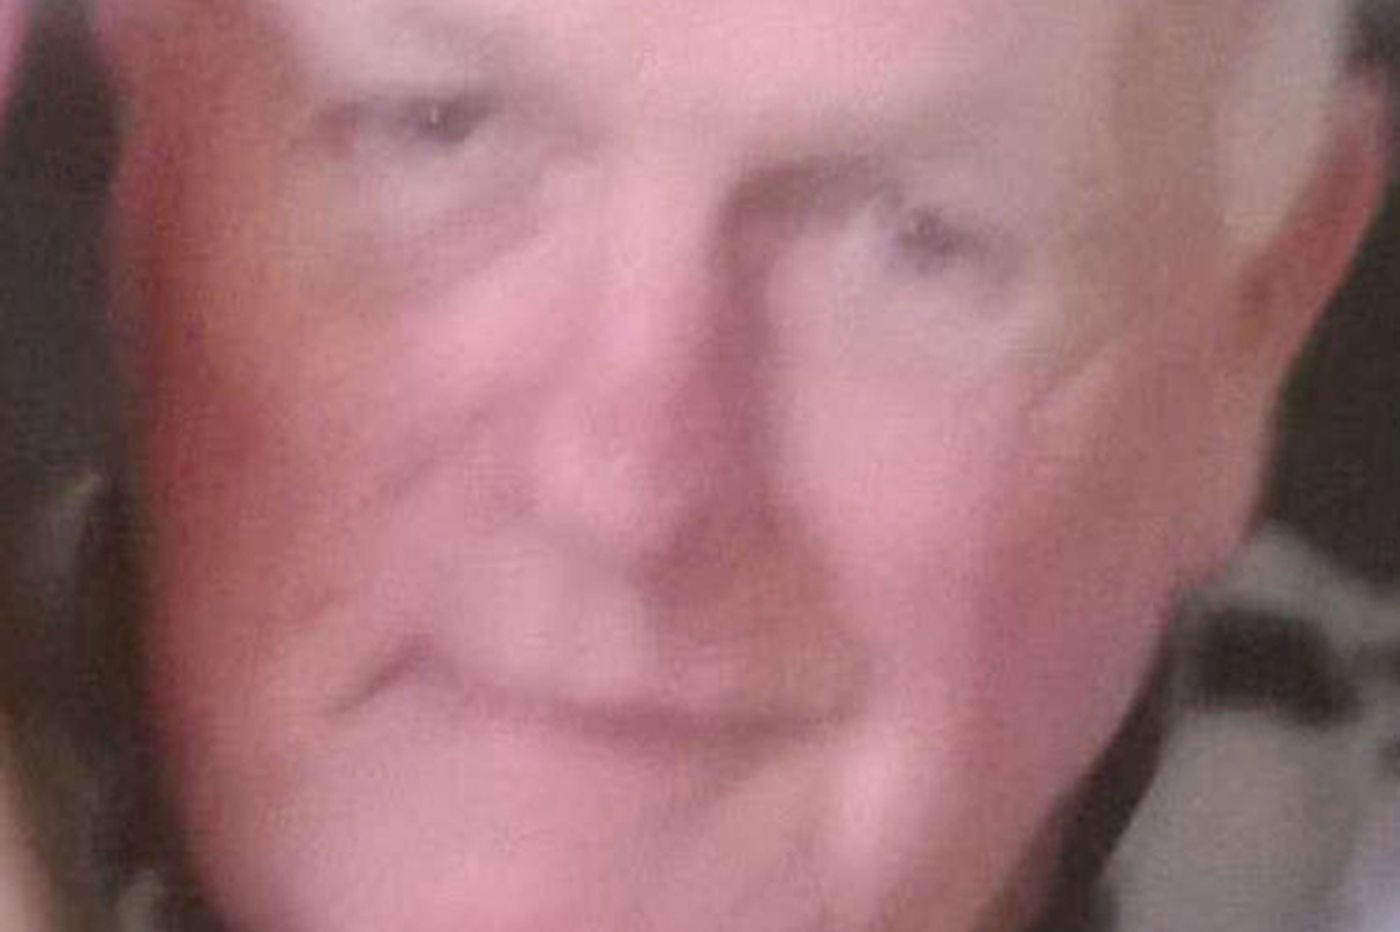 William J. McMonagle, 69, head of Family Court's warrant unit